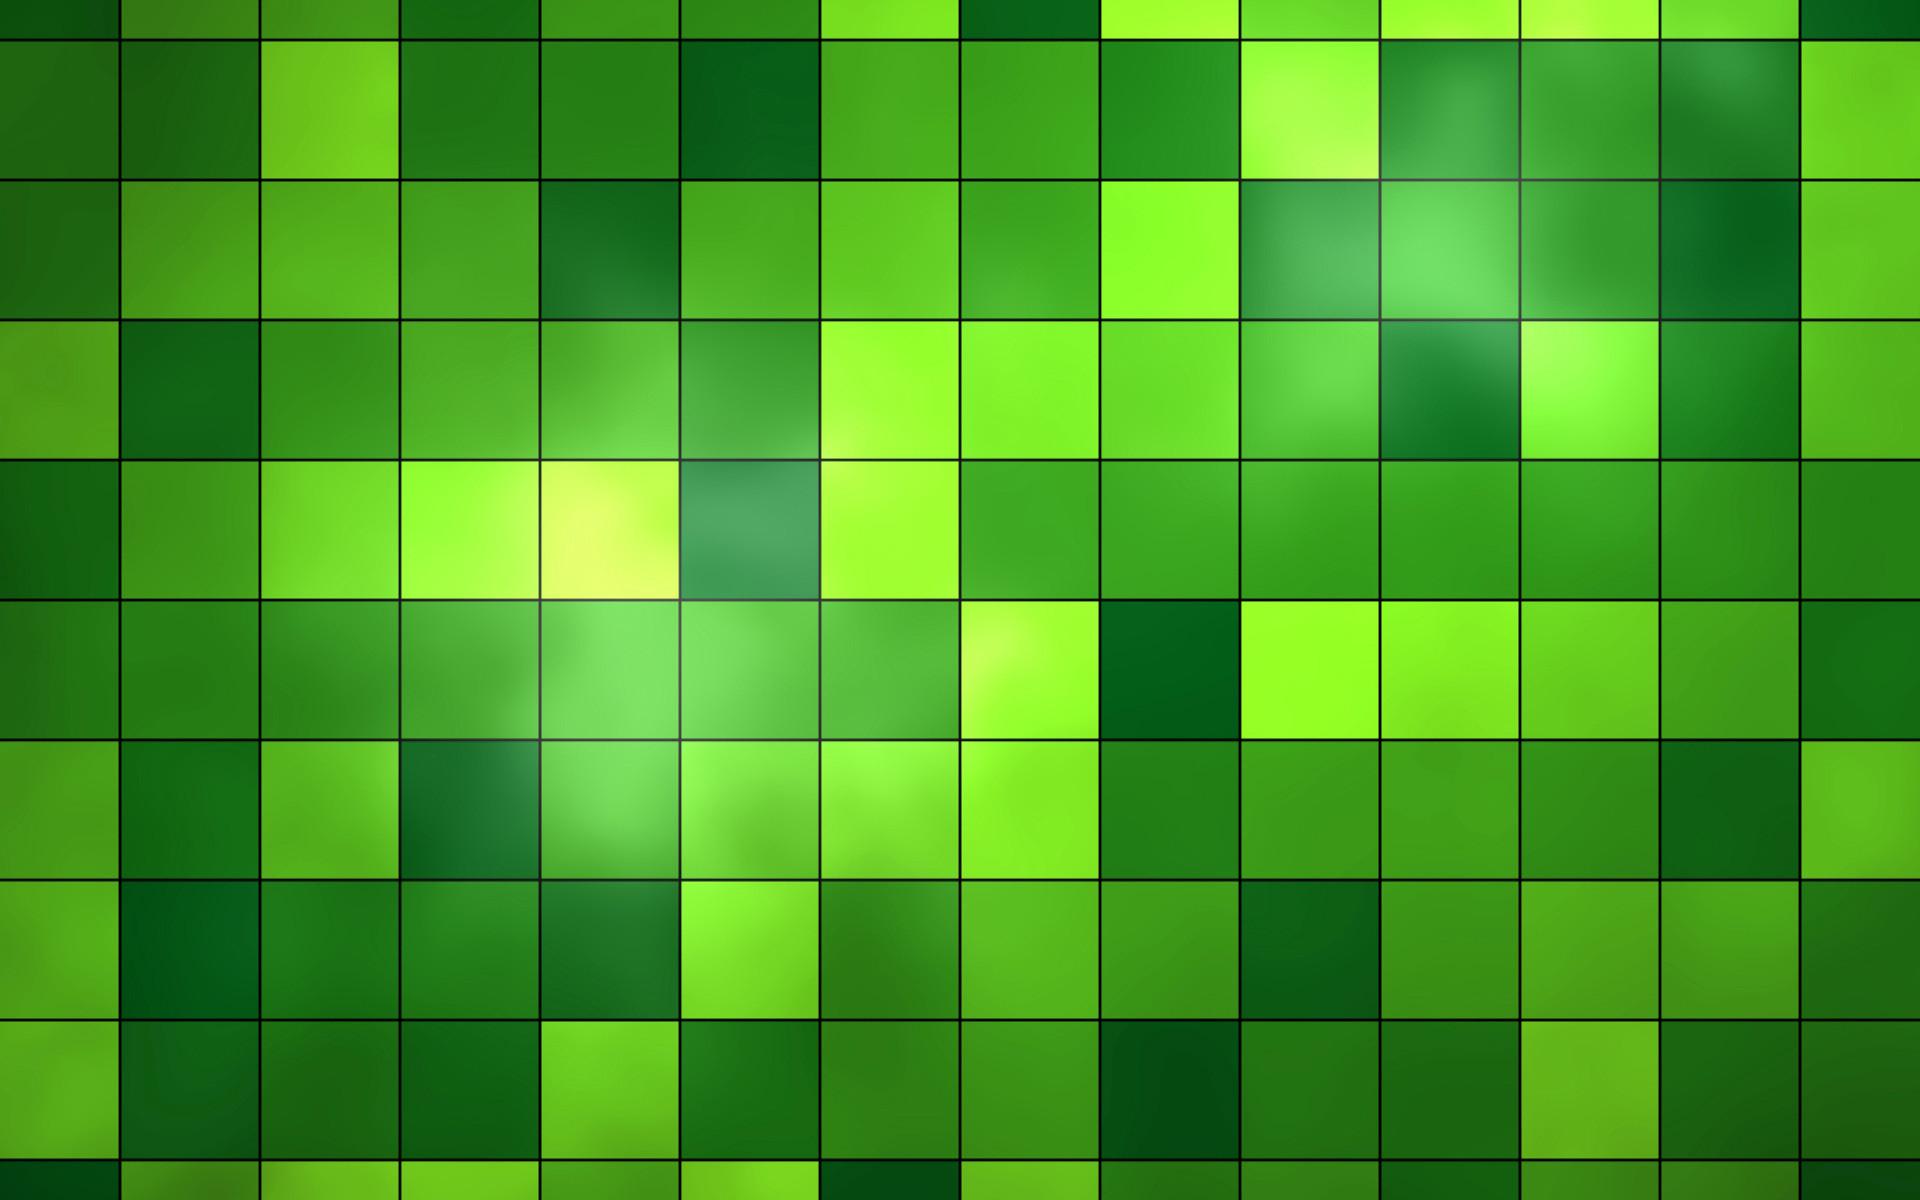 Abstract Green Wallpaper 1